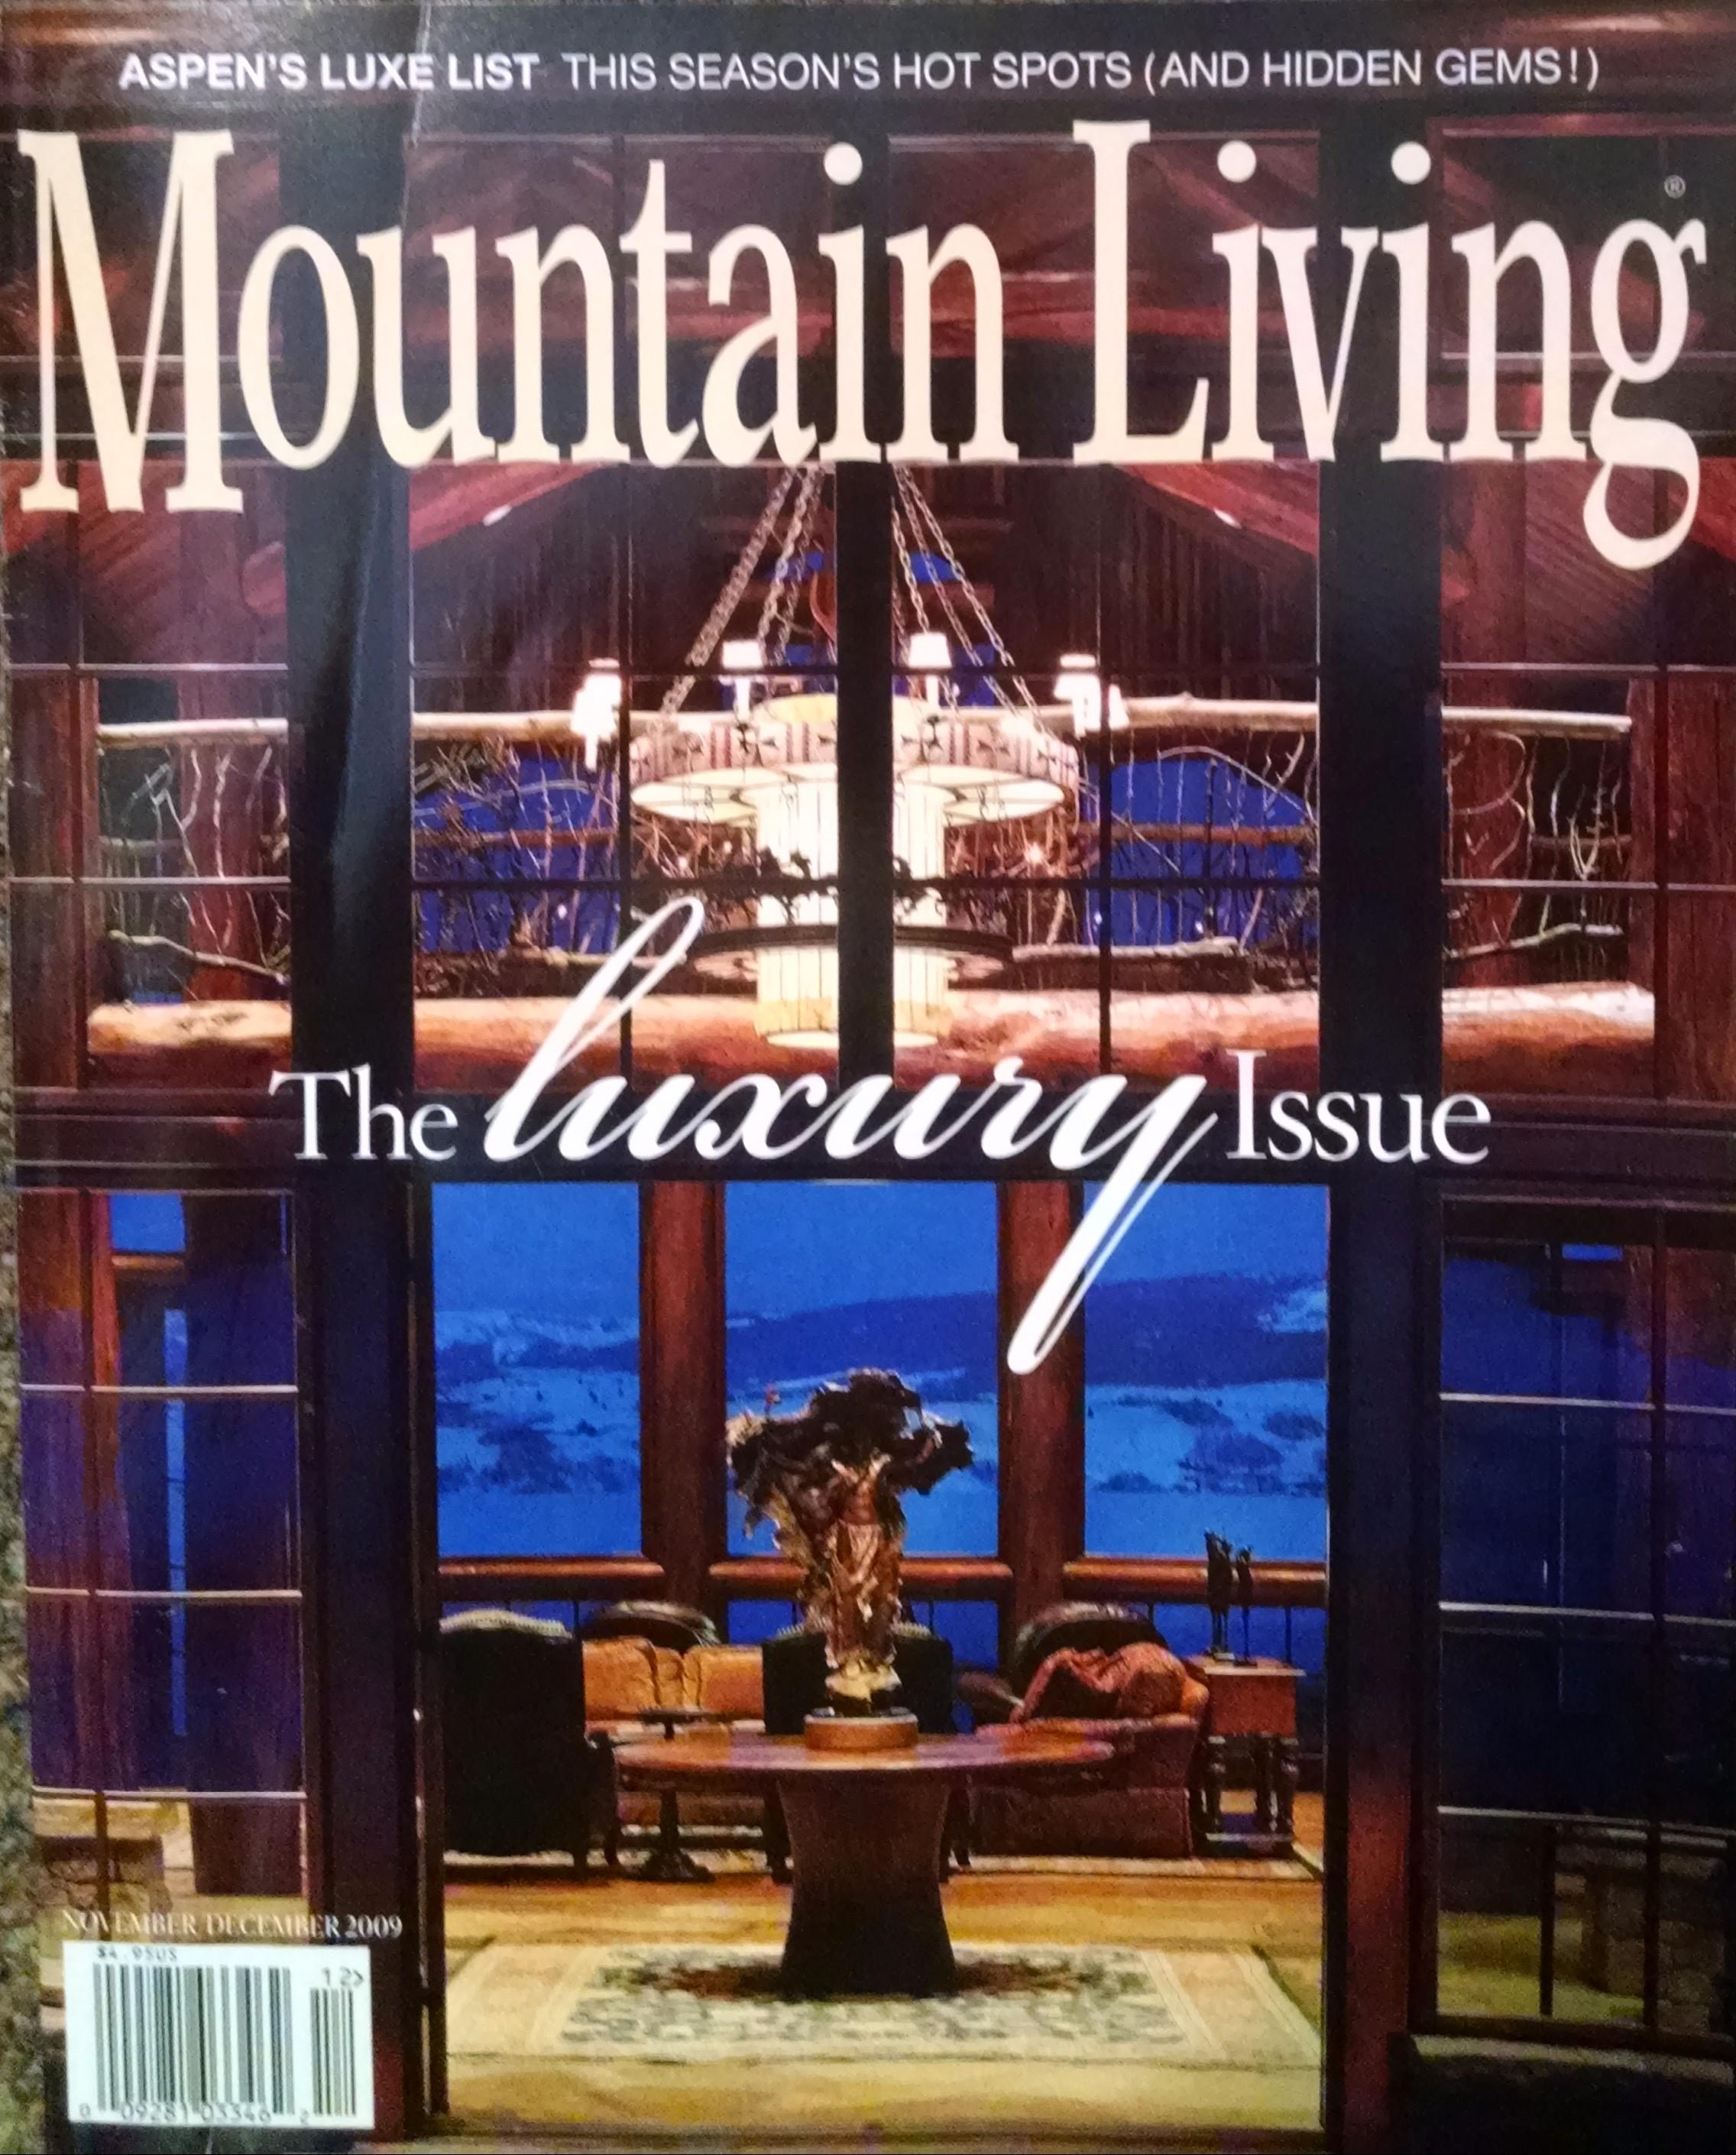 MountainLiving_Cover.jpg